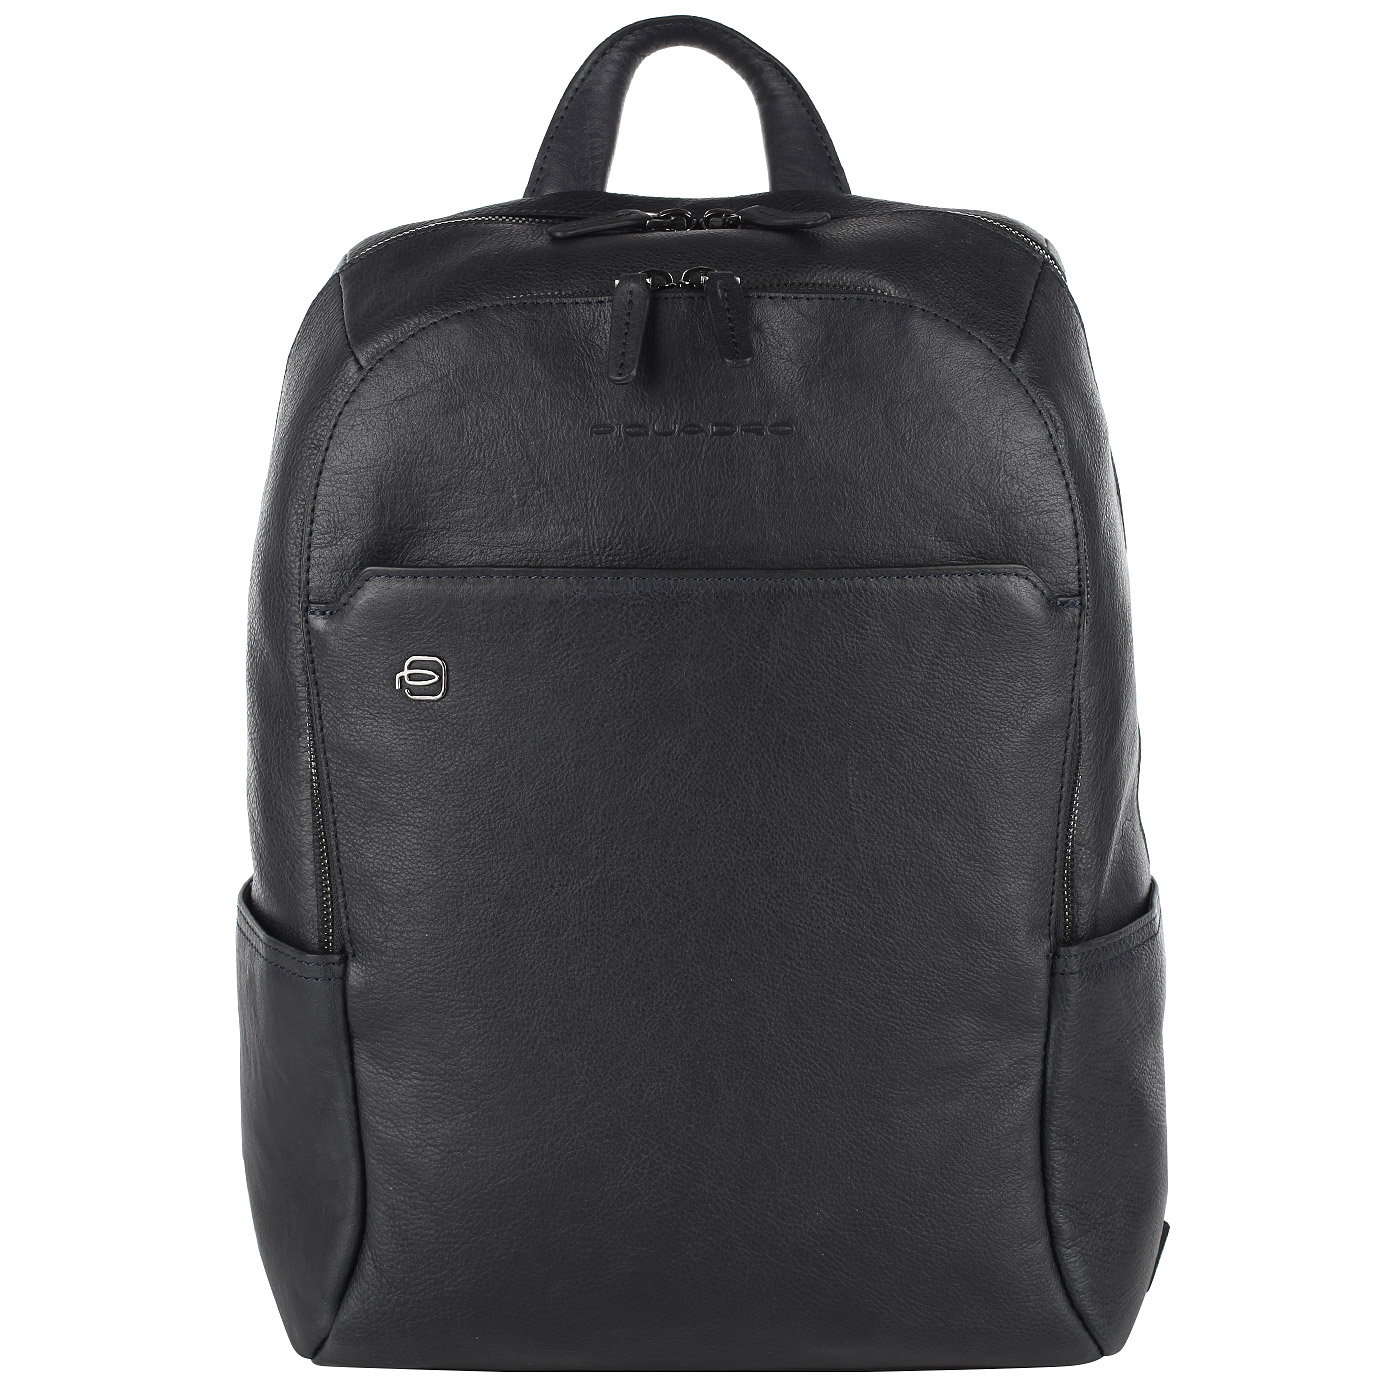 Рюкзак кожаный Piquadro Black Square синий 11 л